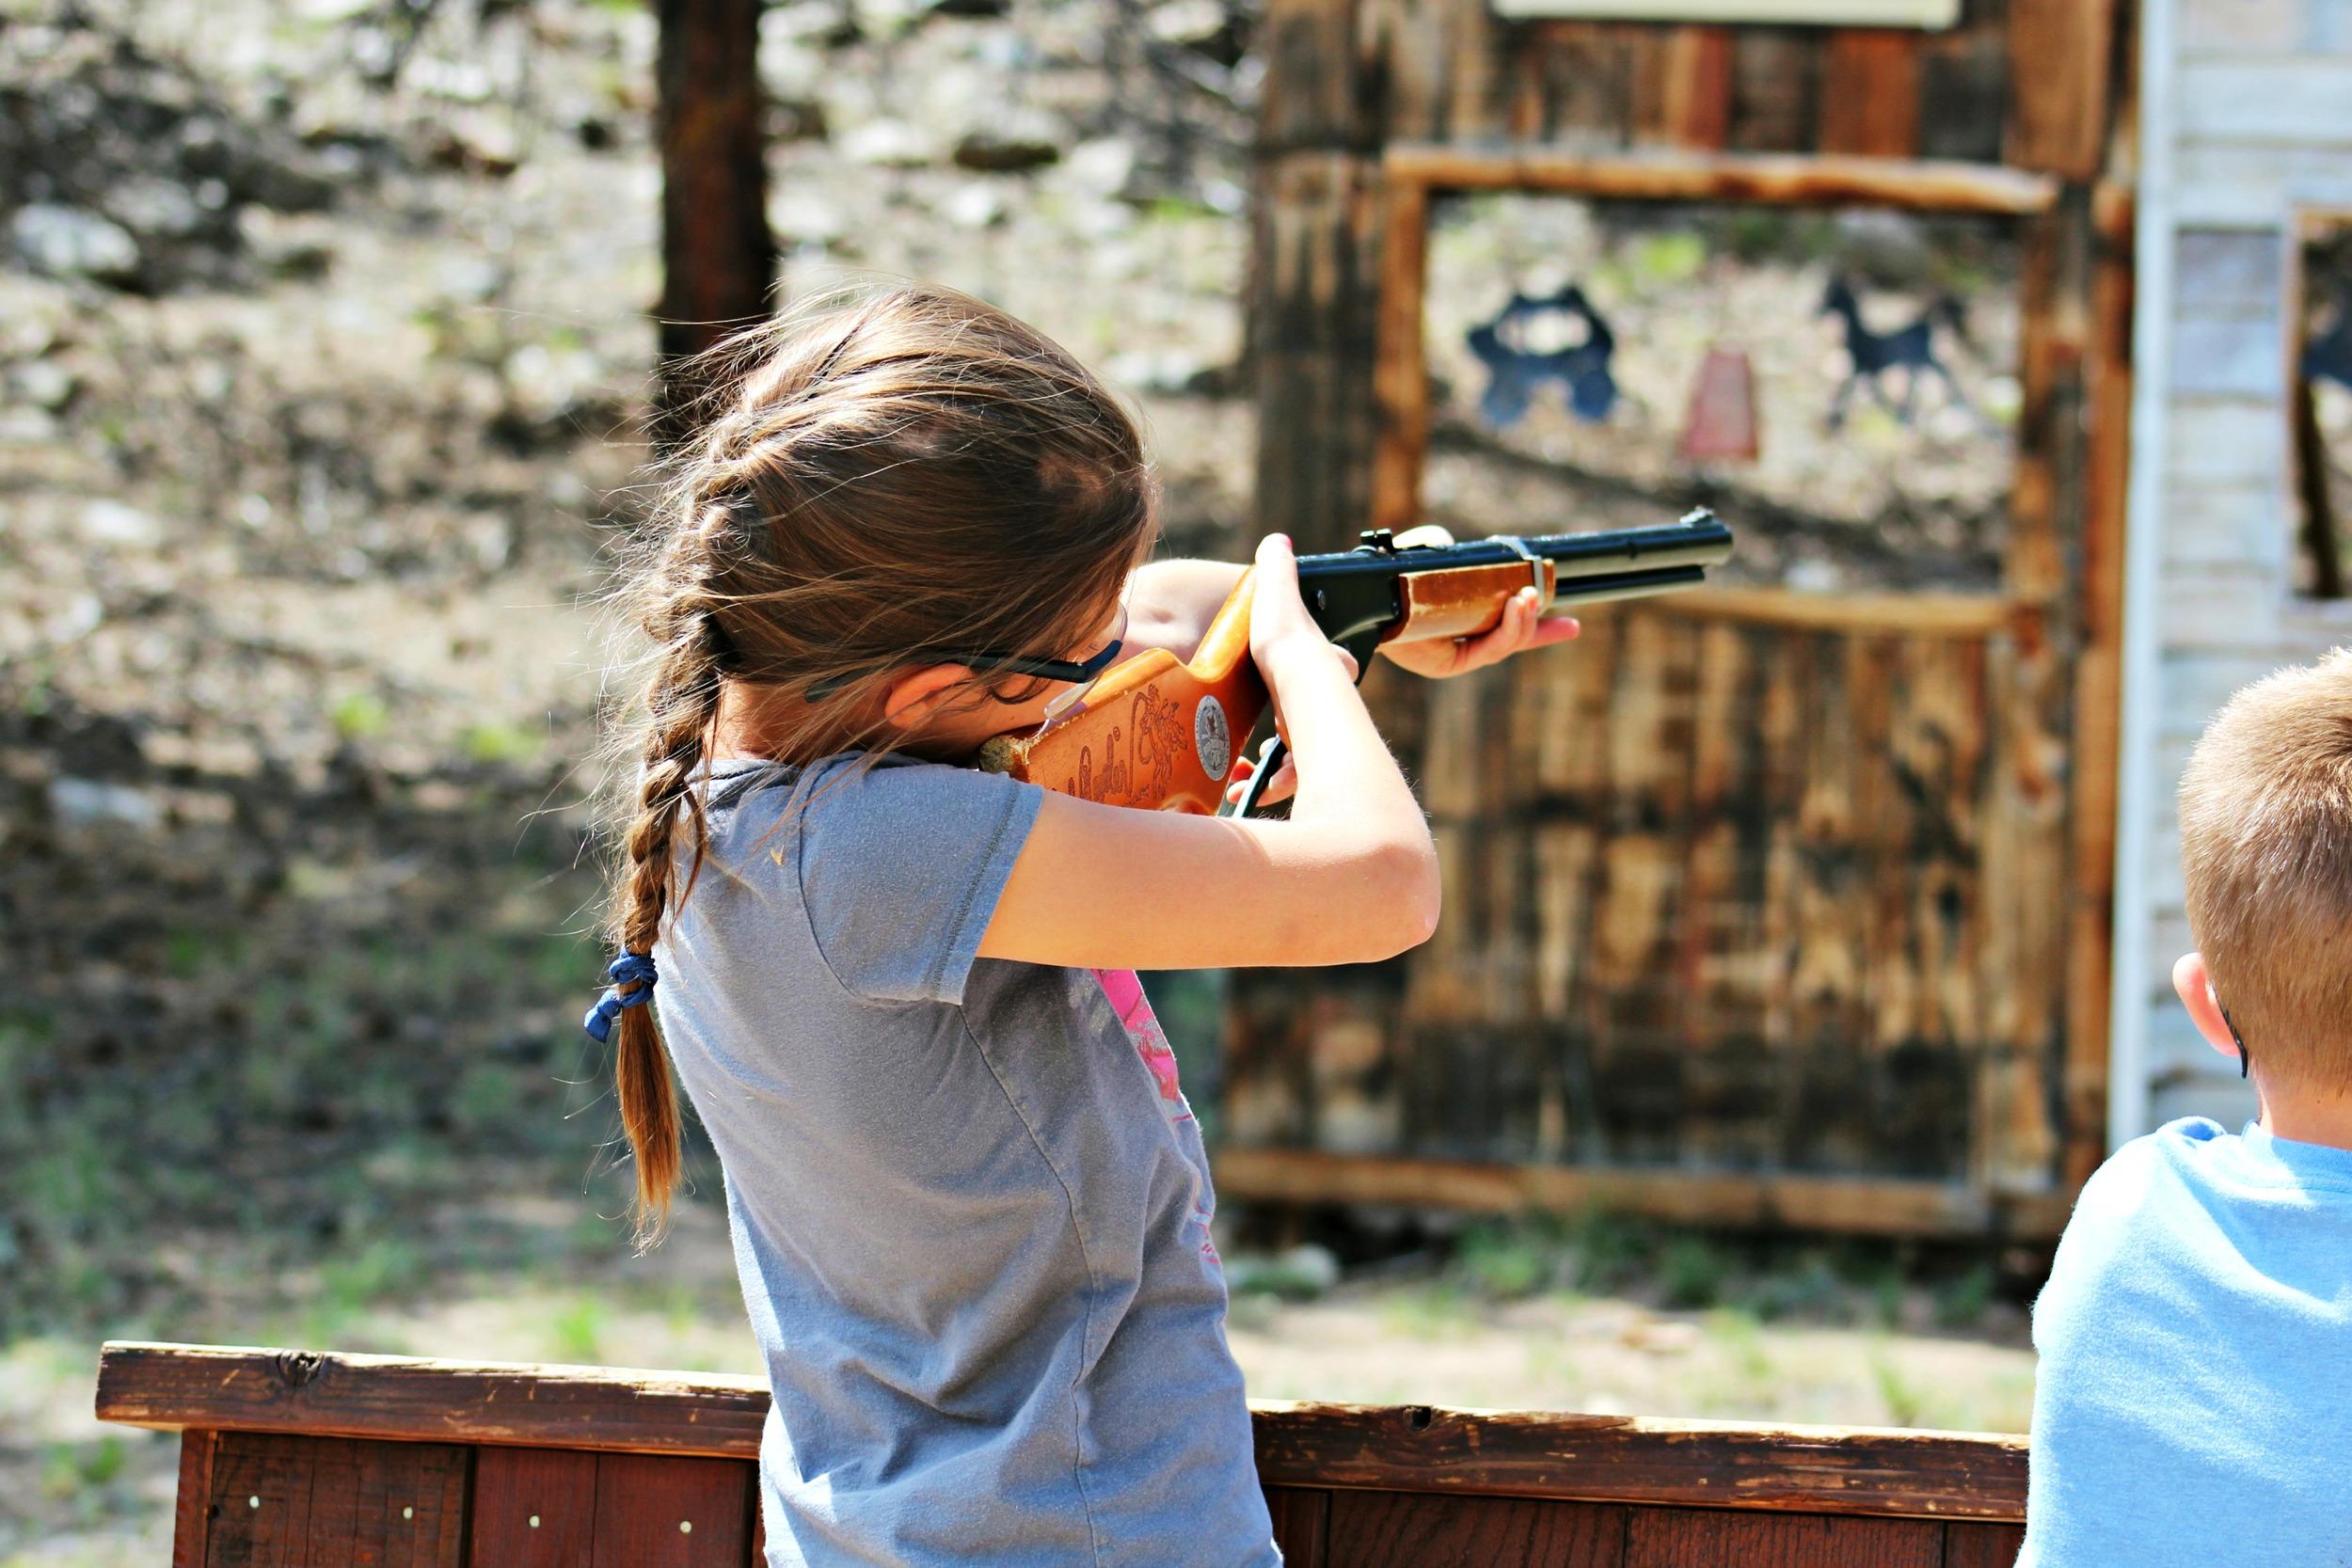 bb-gun-range-girl